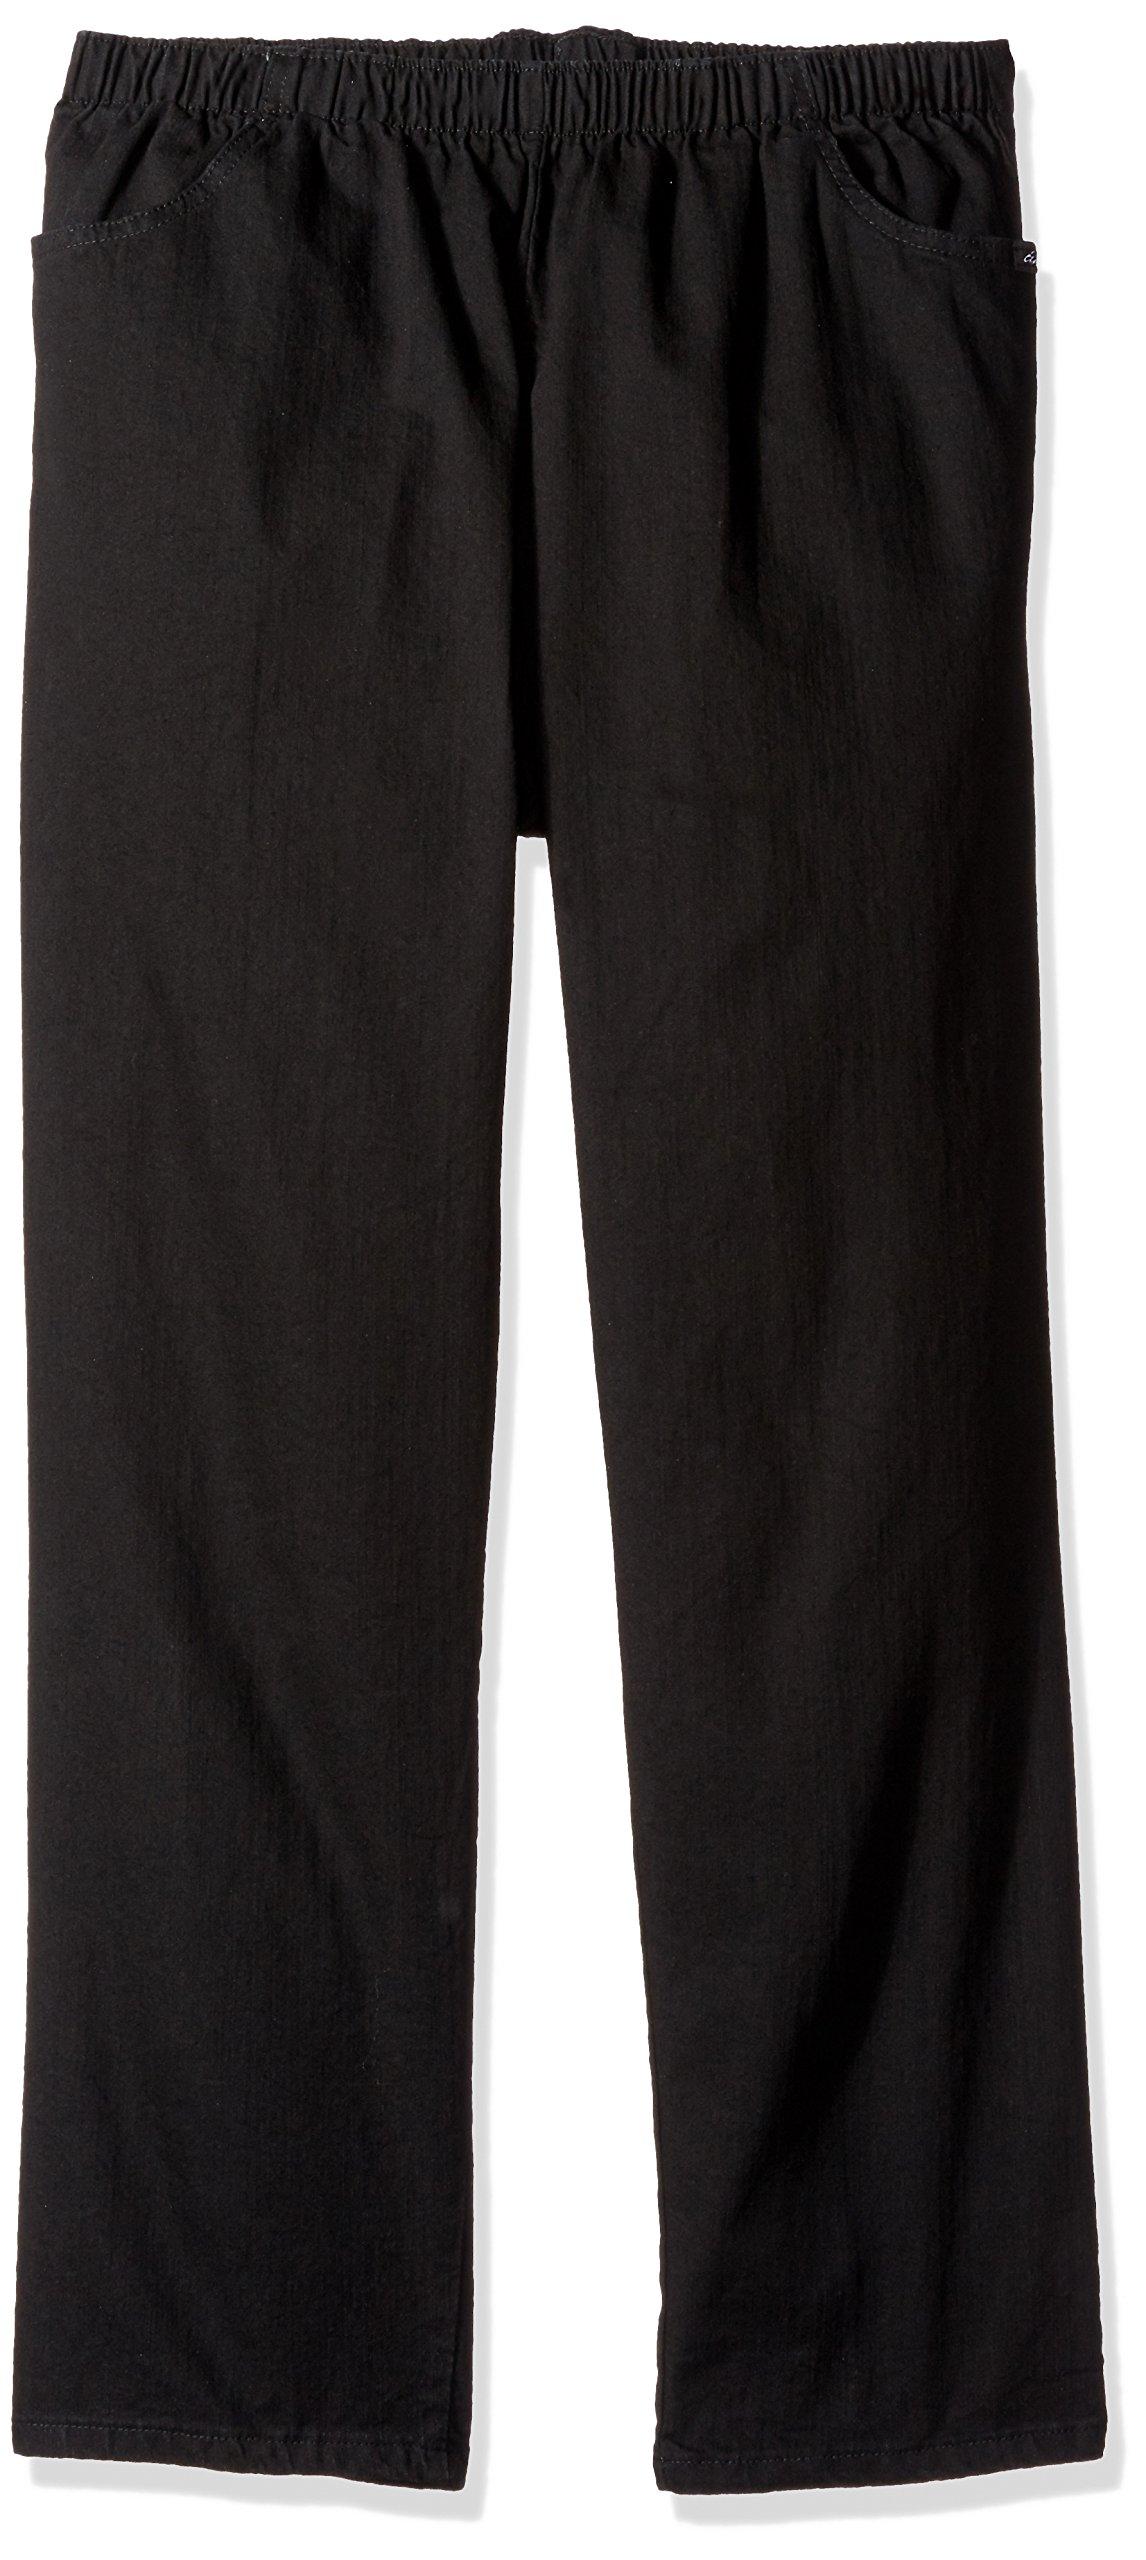 Chic Classic Collection Women's Petite Plus Cotton Pull-On Pant with Elastic Waist, Black Denim, 22P